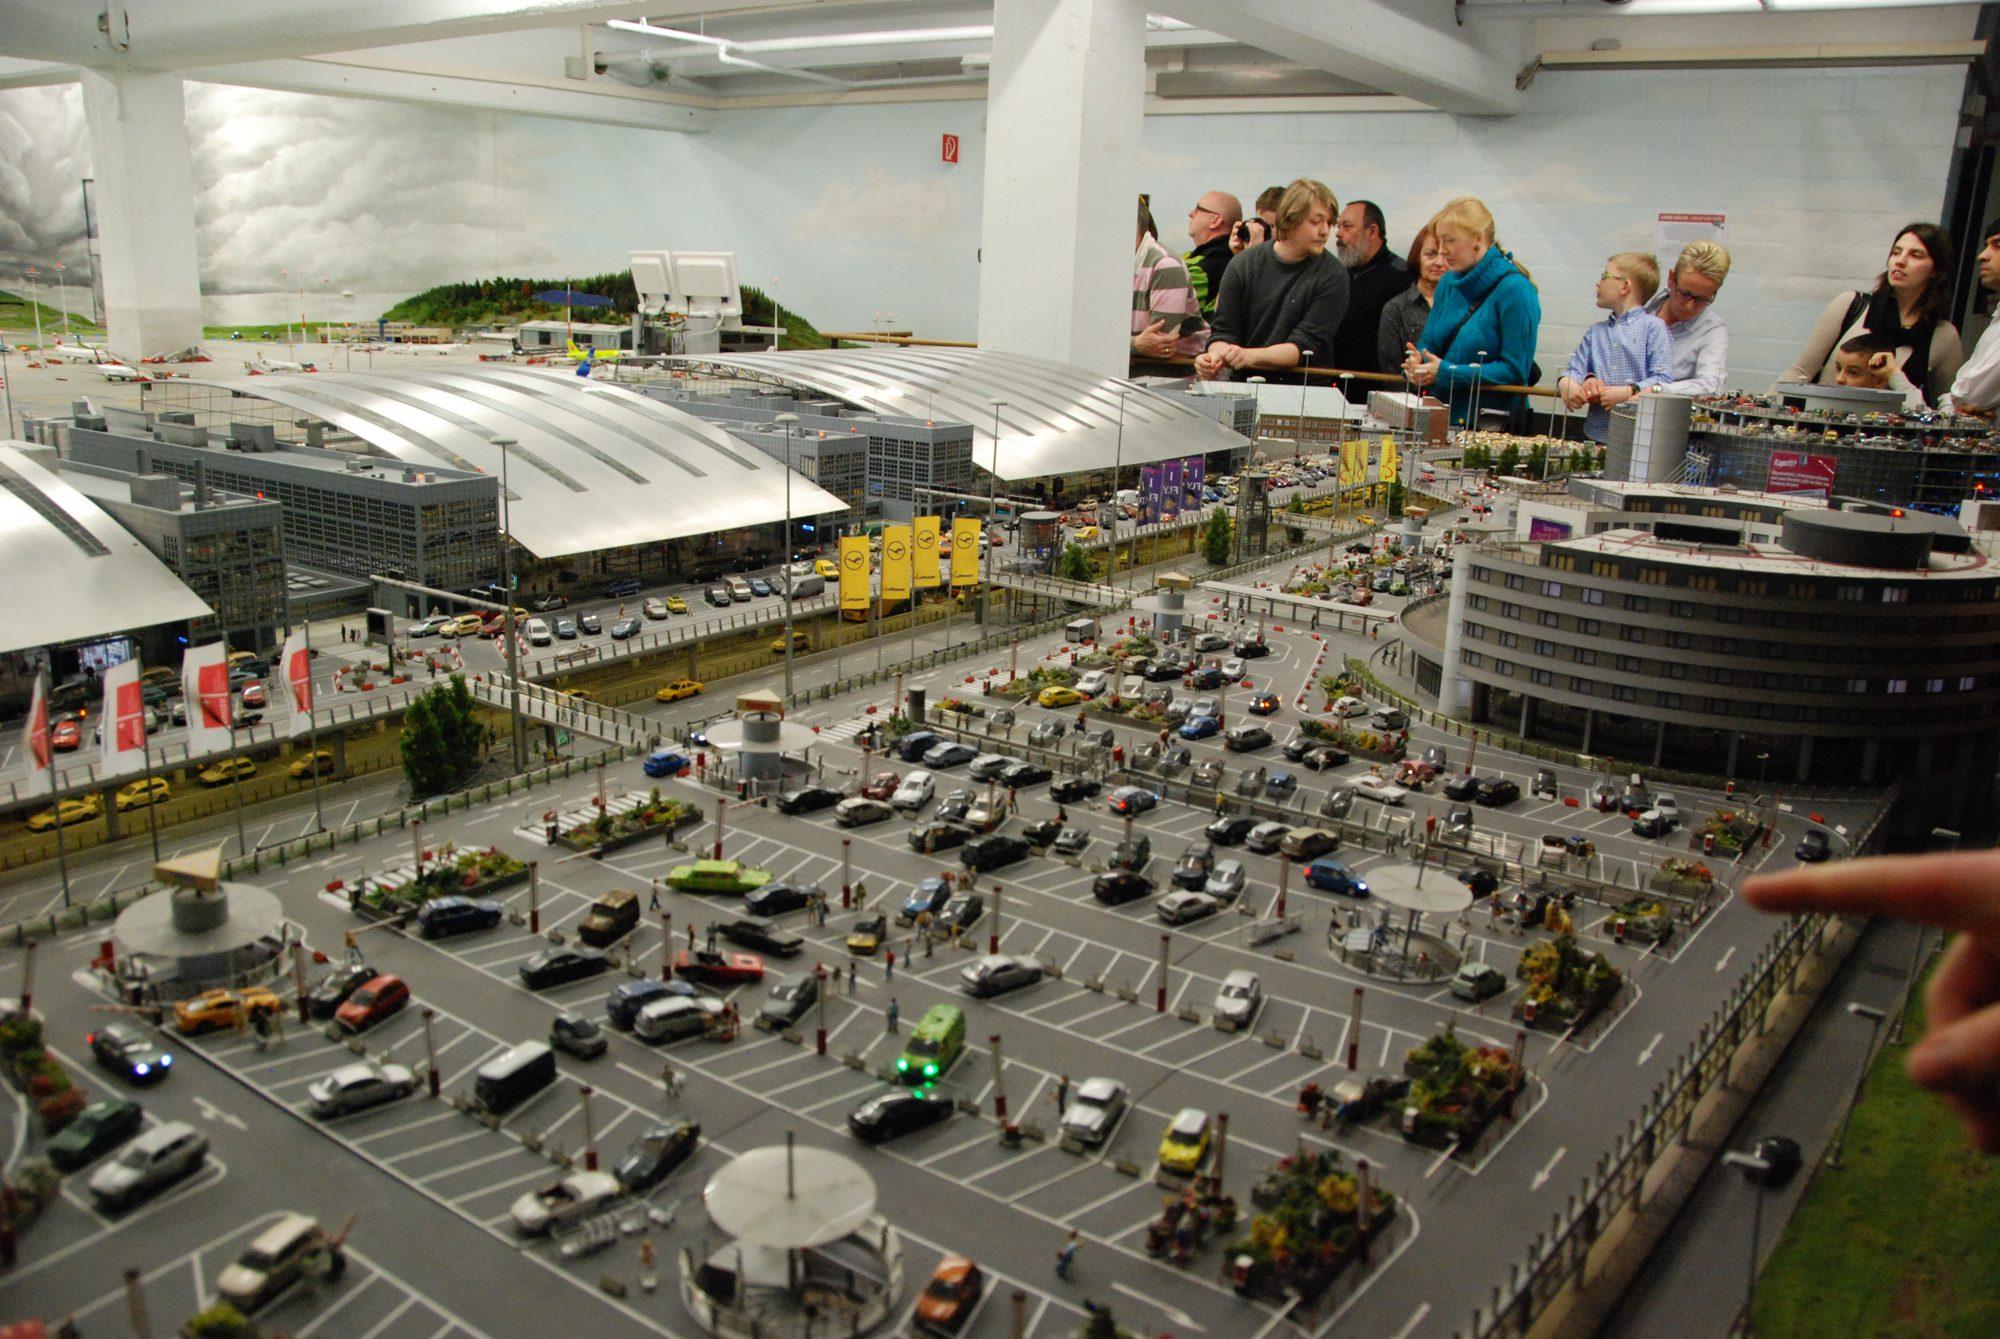 Hamburg - Miniatur Wunderland, Flughafen